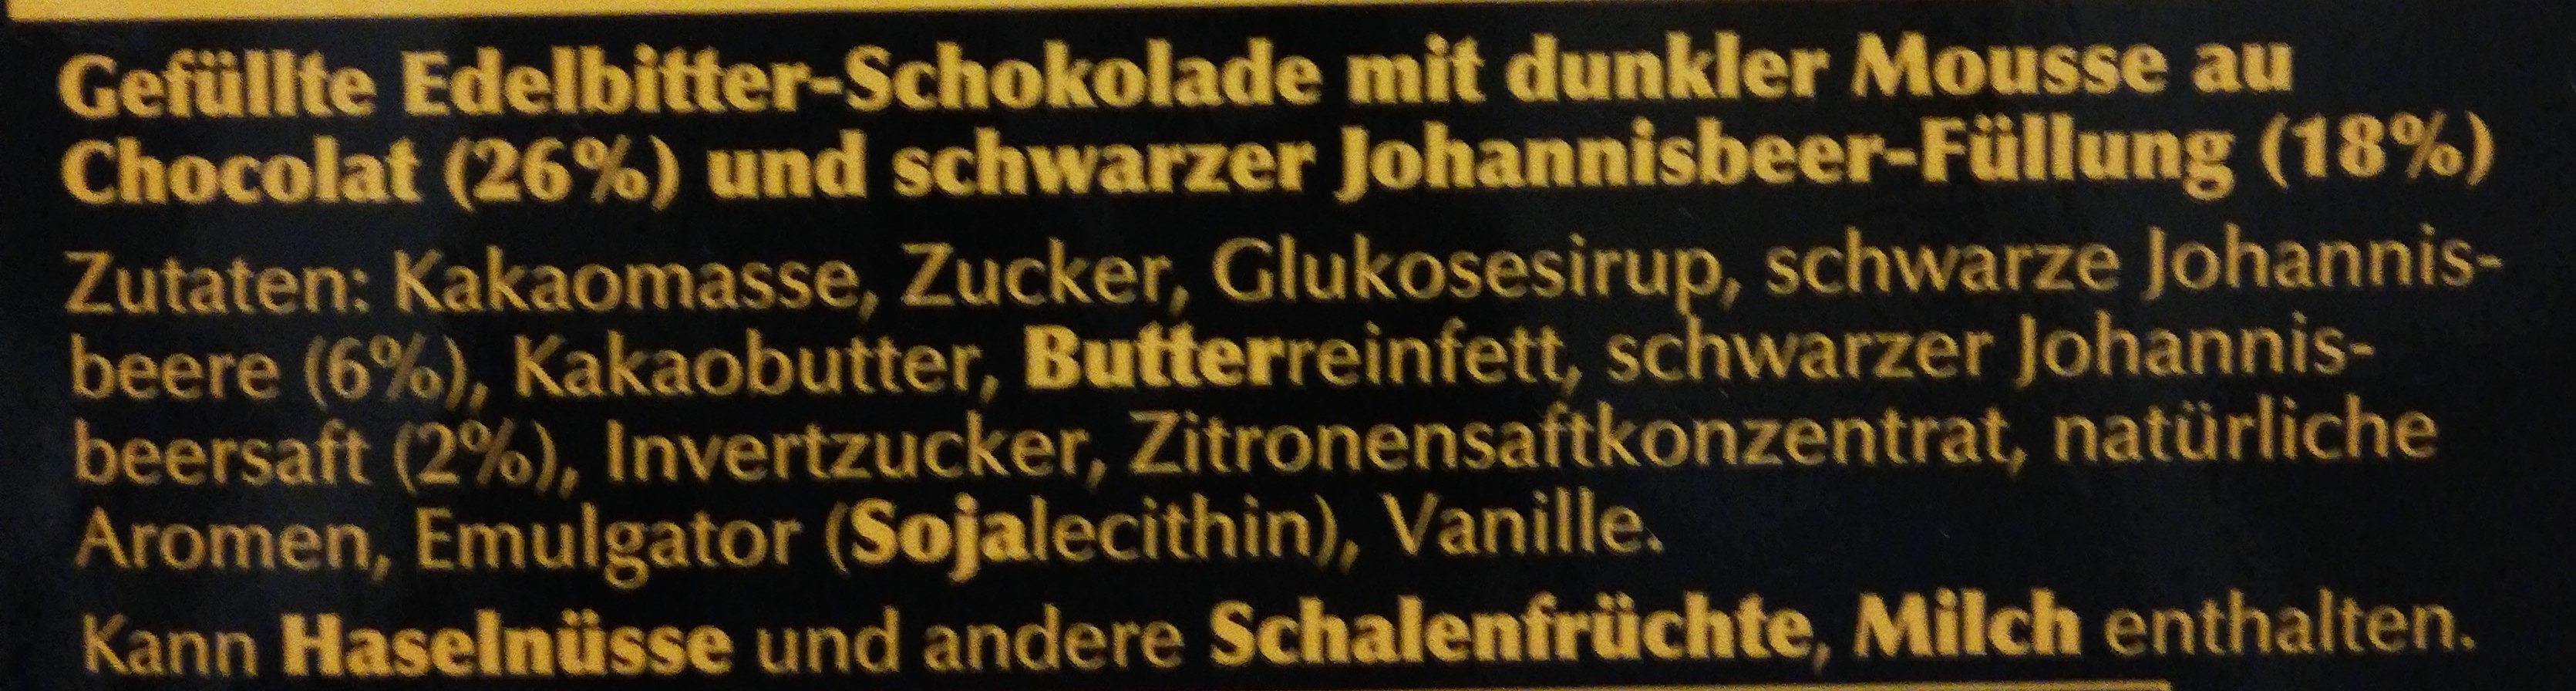 Edelbitter Mousse Schwarze Johannesbeere - Ingrédients